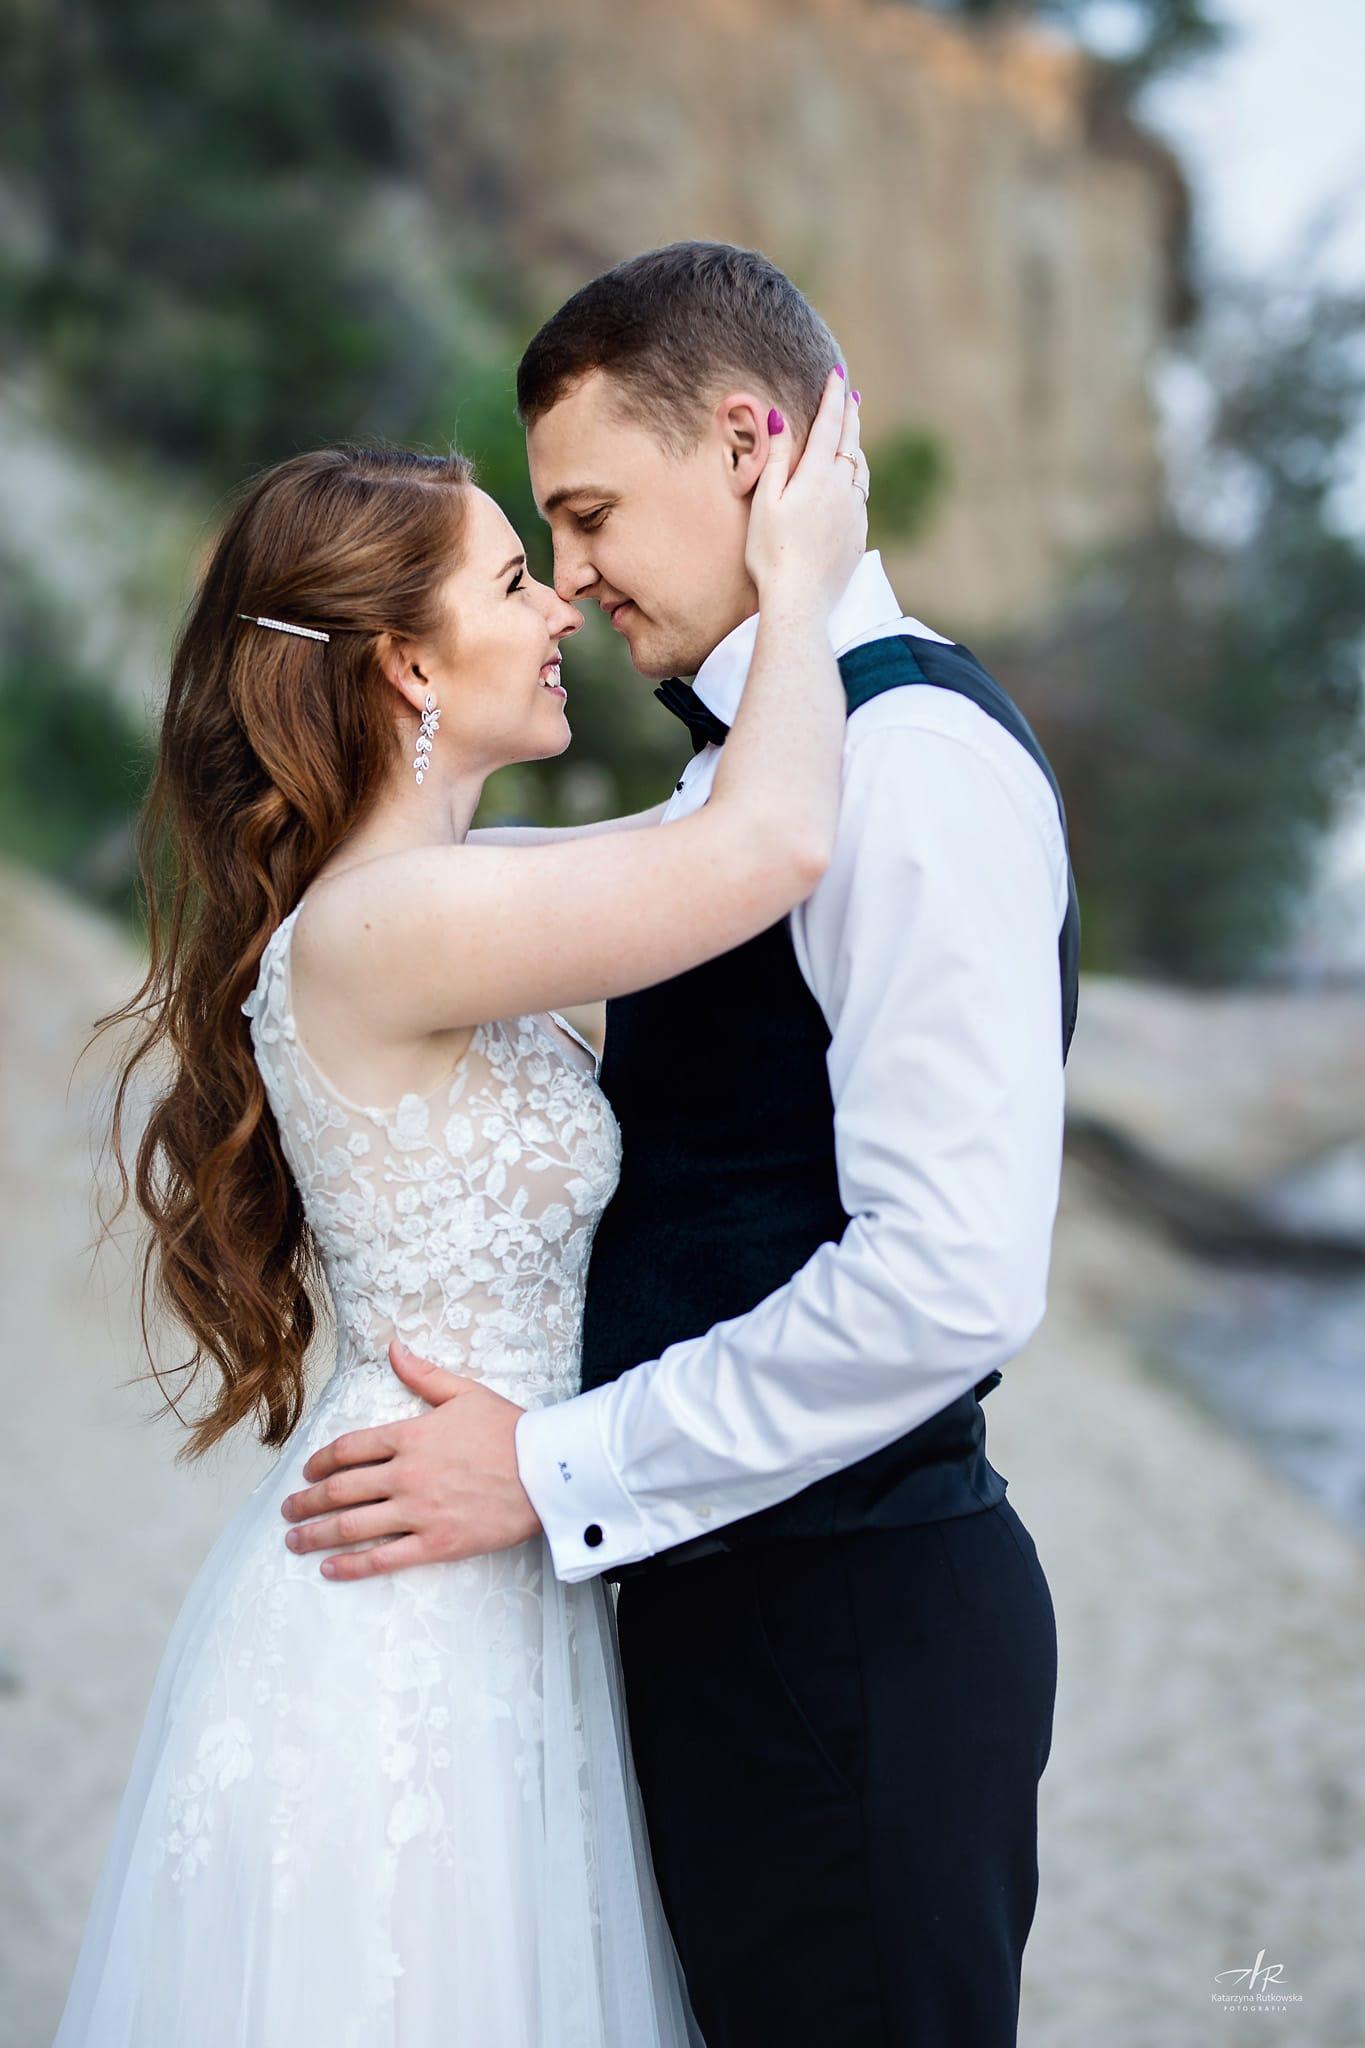 Sesja ślubna - Plaża